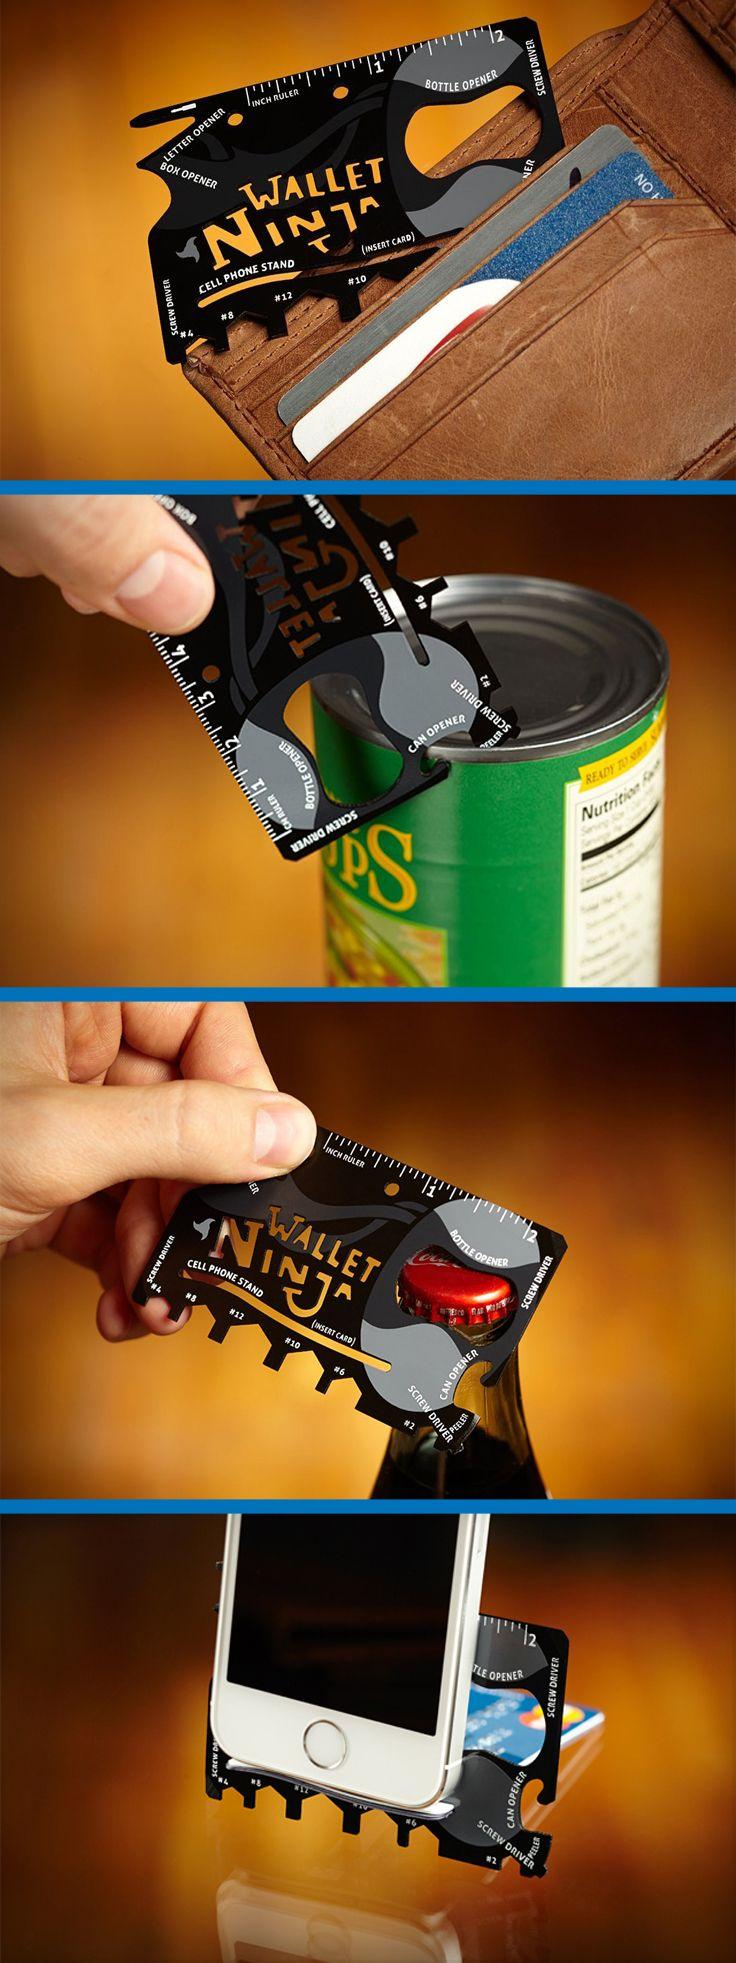 Wallet Ninja 18 in 1 Multi-purpose Credit Card Size Pocket Tool gift | gadgets | tools